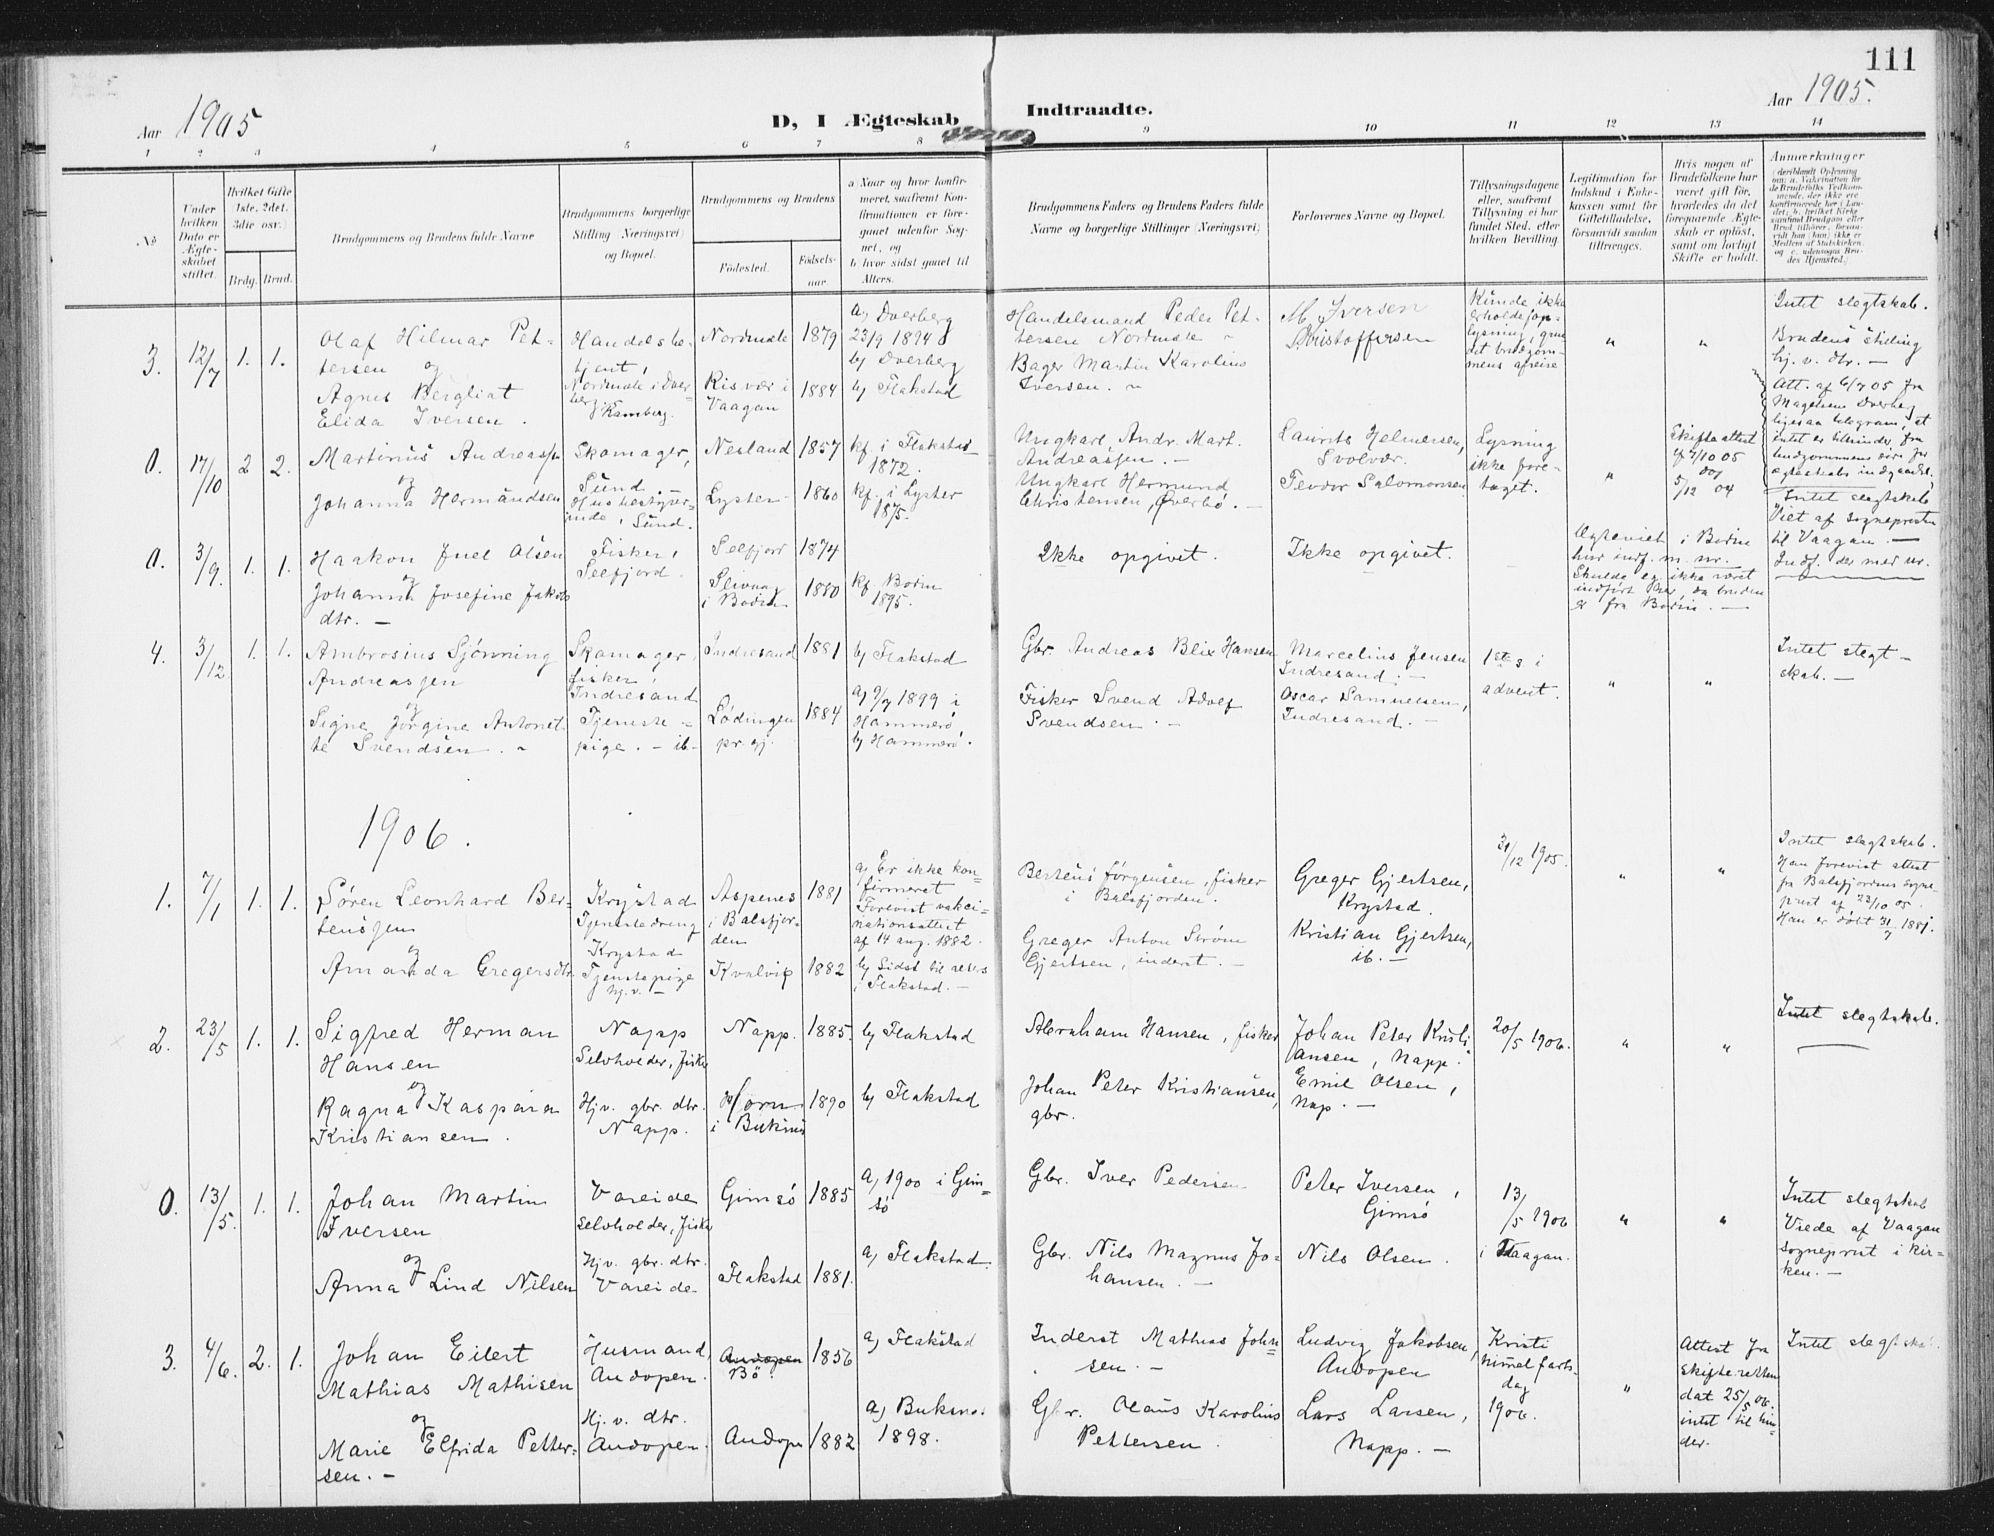 SAT, Ministerialprotokoller, klokkerbøker og fødselsregistre - Nordland, 885/L1206: Ministerialbok nr. 885A07, 1905-1915, s. 111